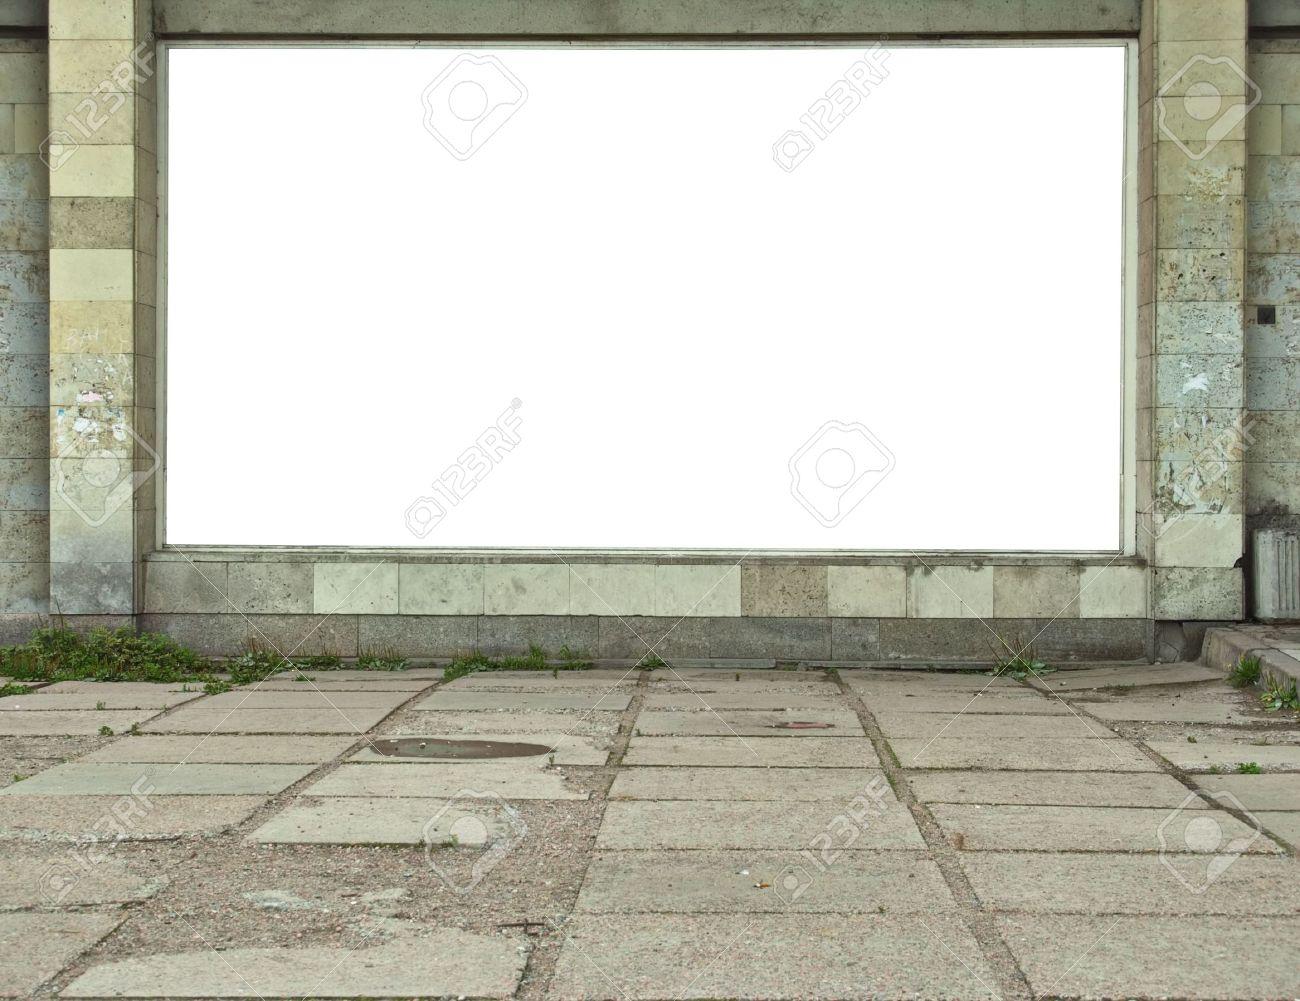 Wall-mounted billboard Stock Photo - 5802756